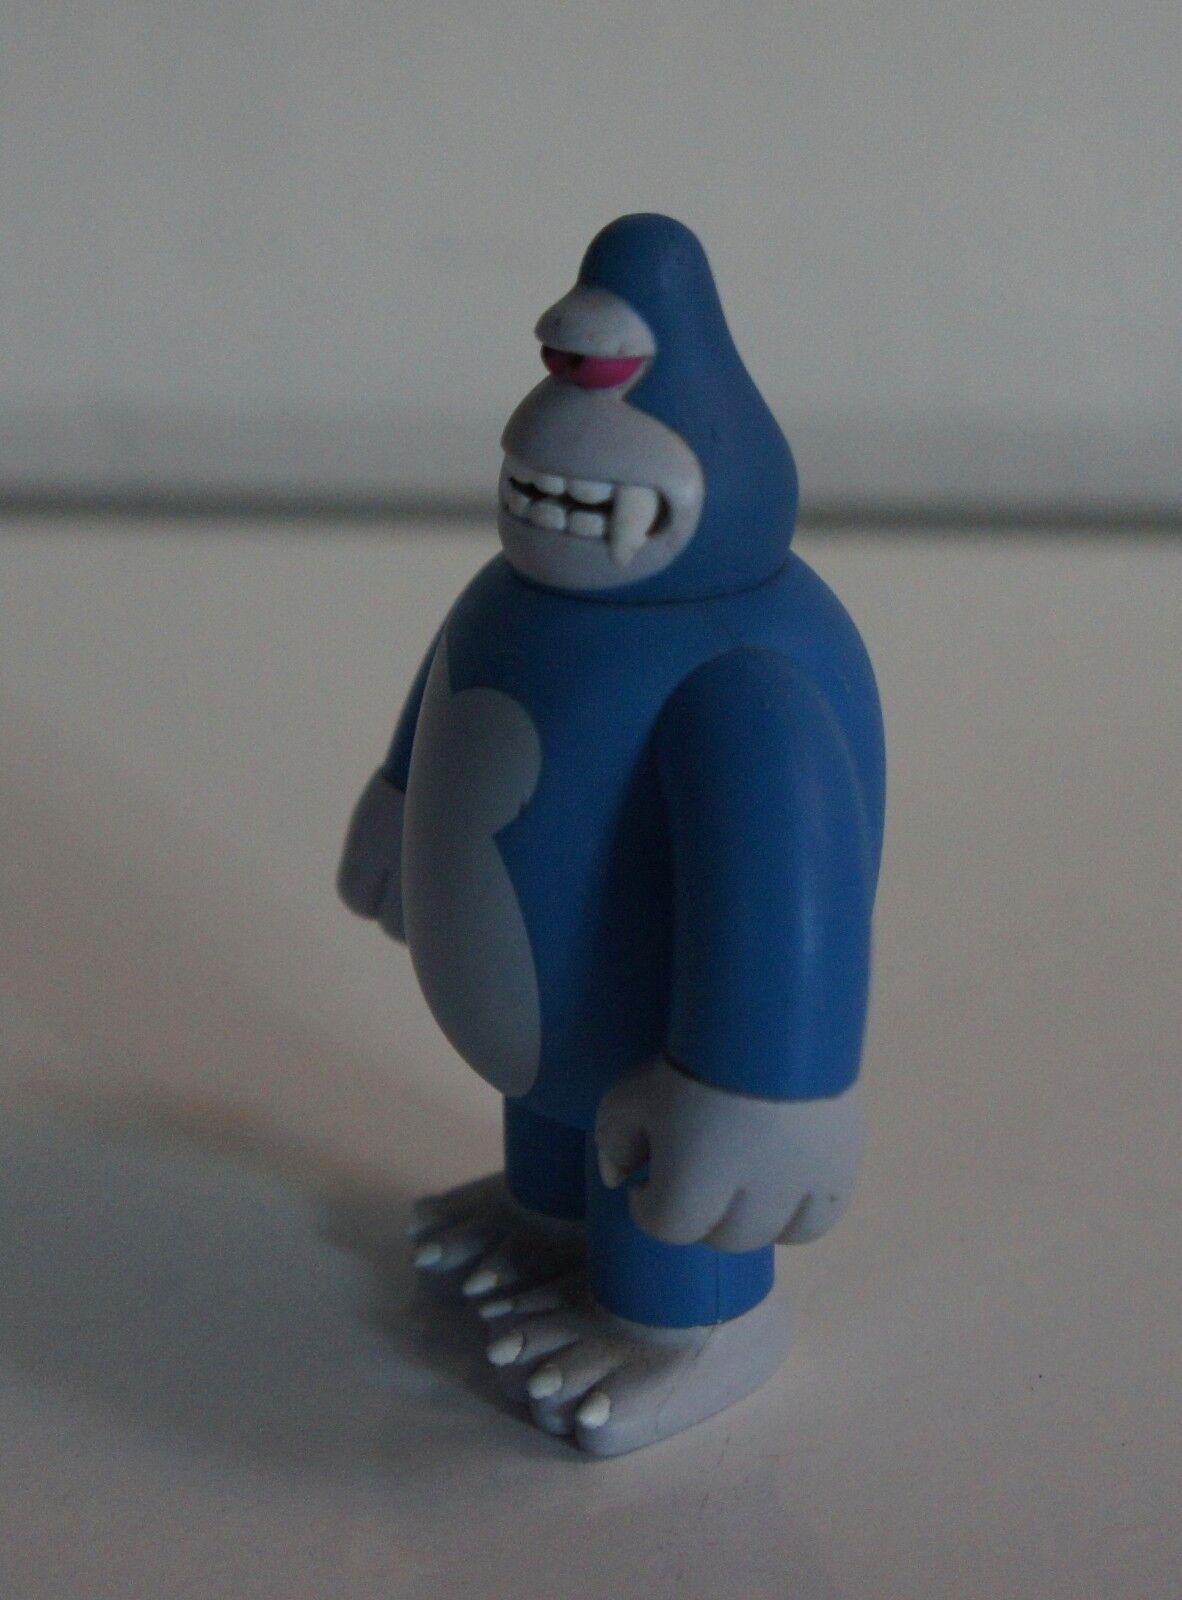 James Jarvis king king Jarvis ken Mini Figure 3.5 bluee 2bac38